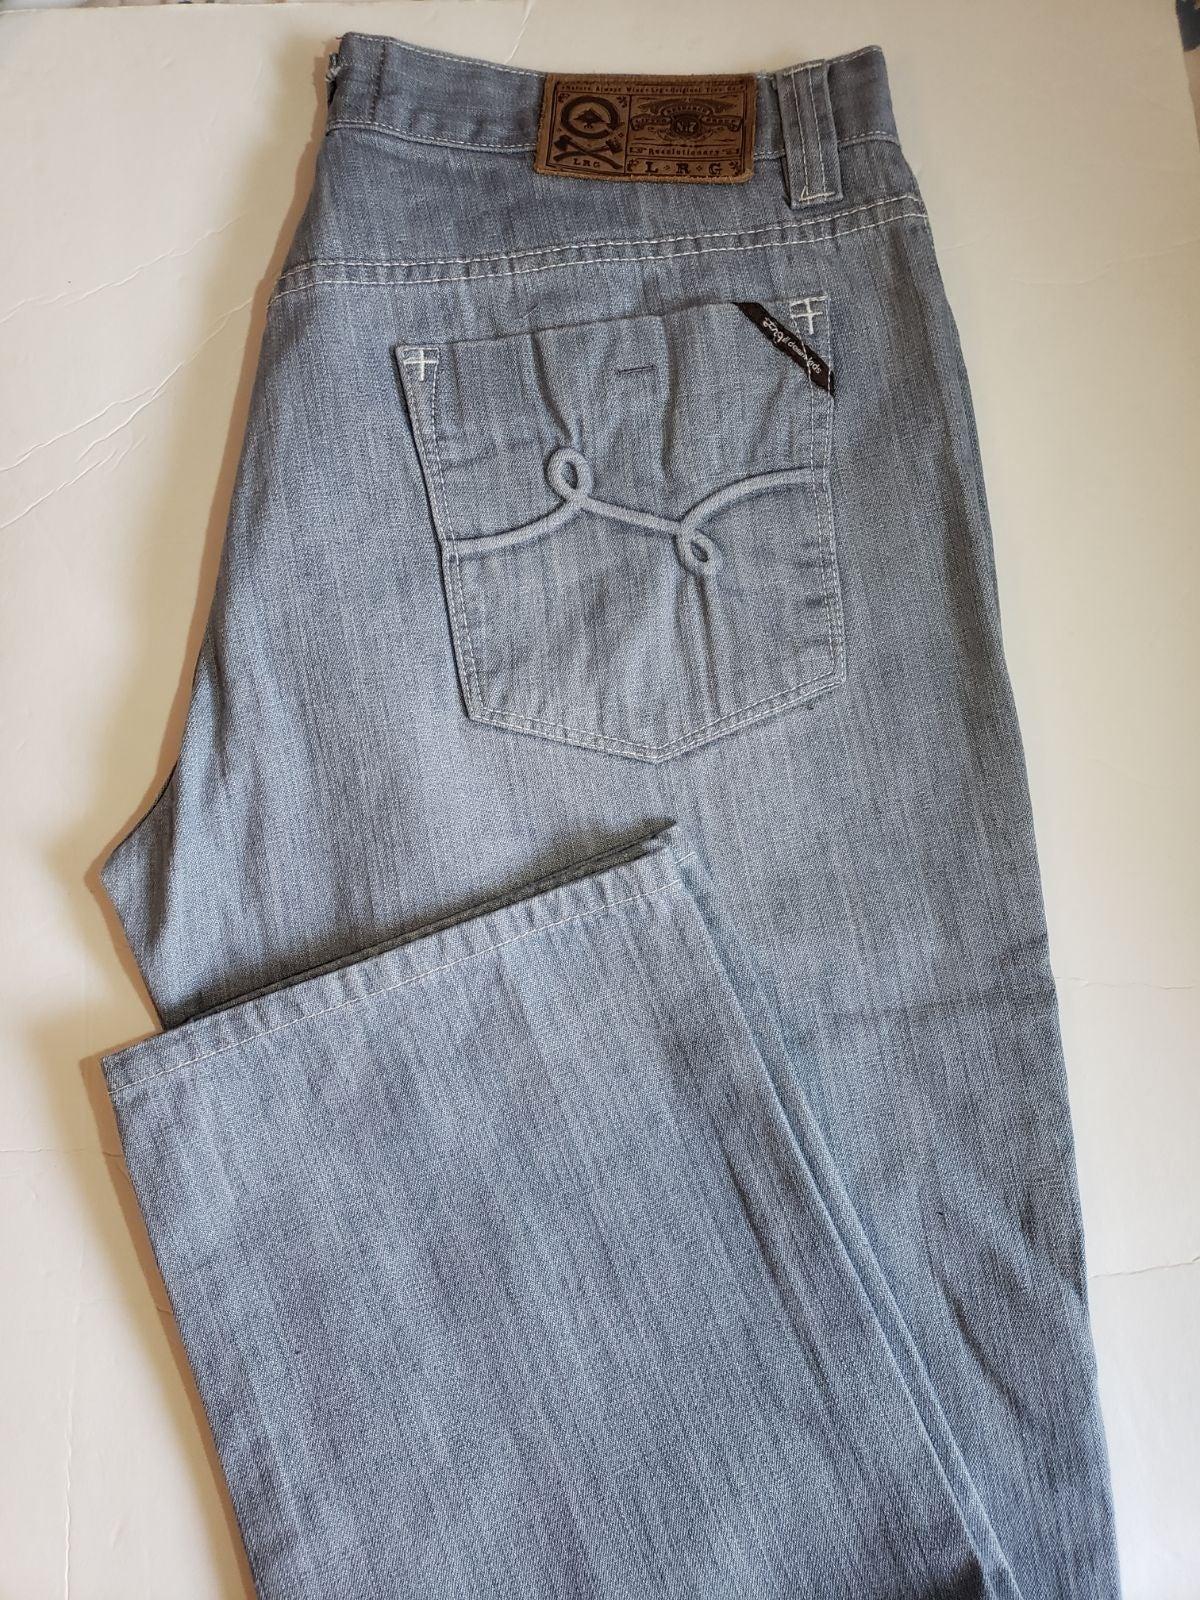 LRG jeans denim jeans